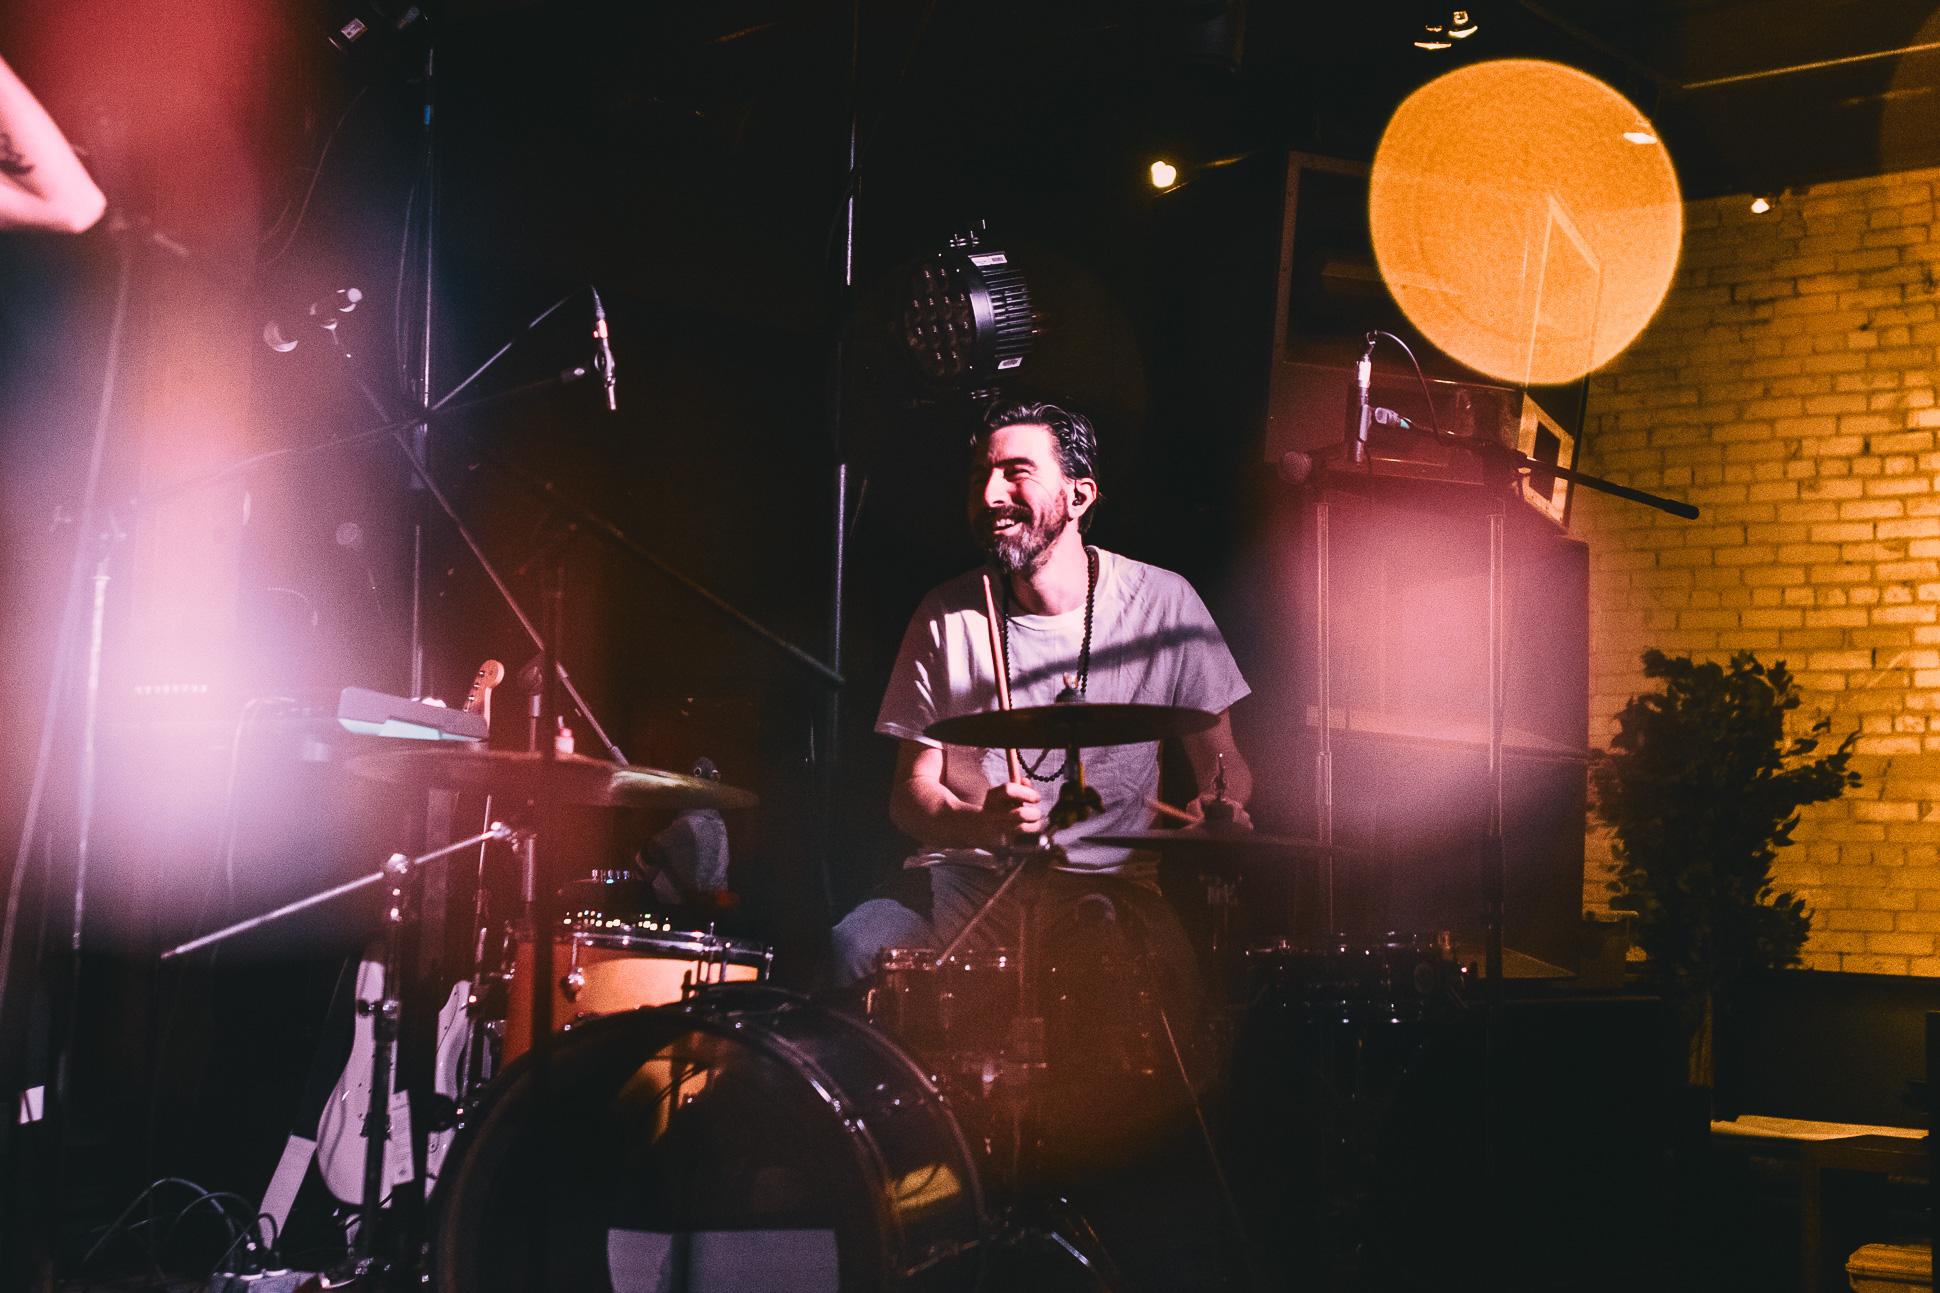 YoungAndSick-FortuneSoundClub-24-01-2019-Vancouver-19.jpg